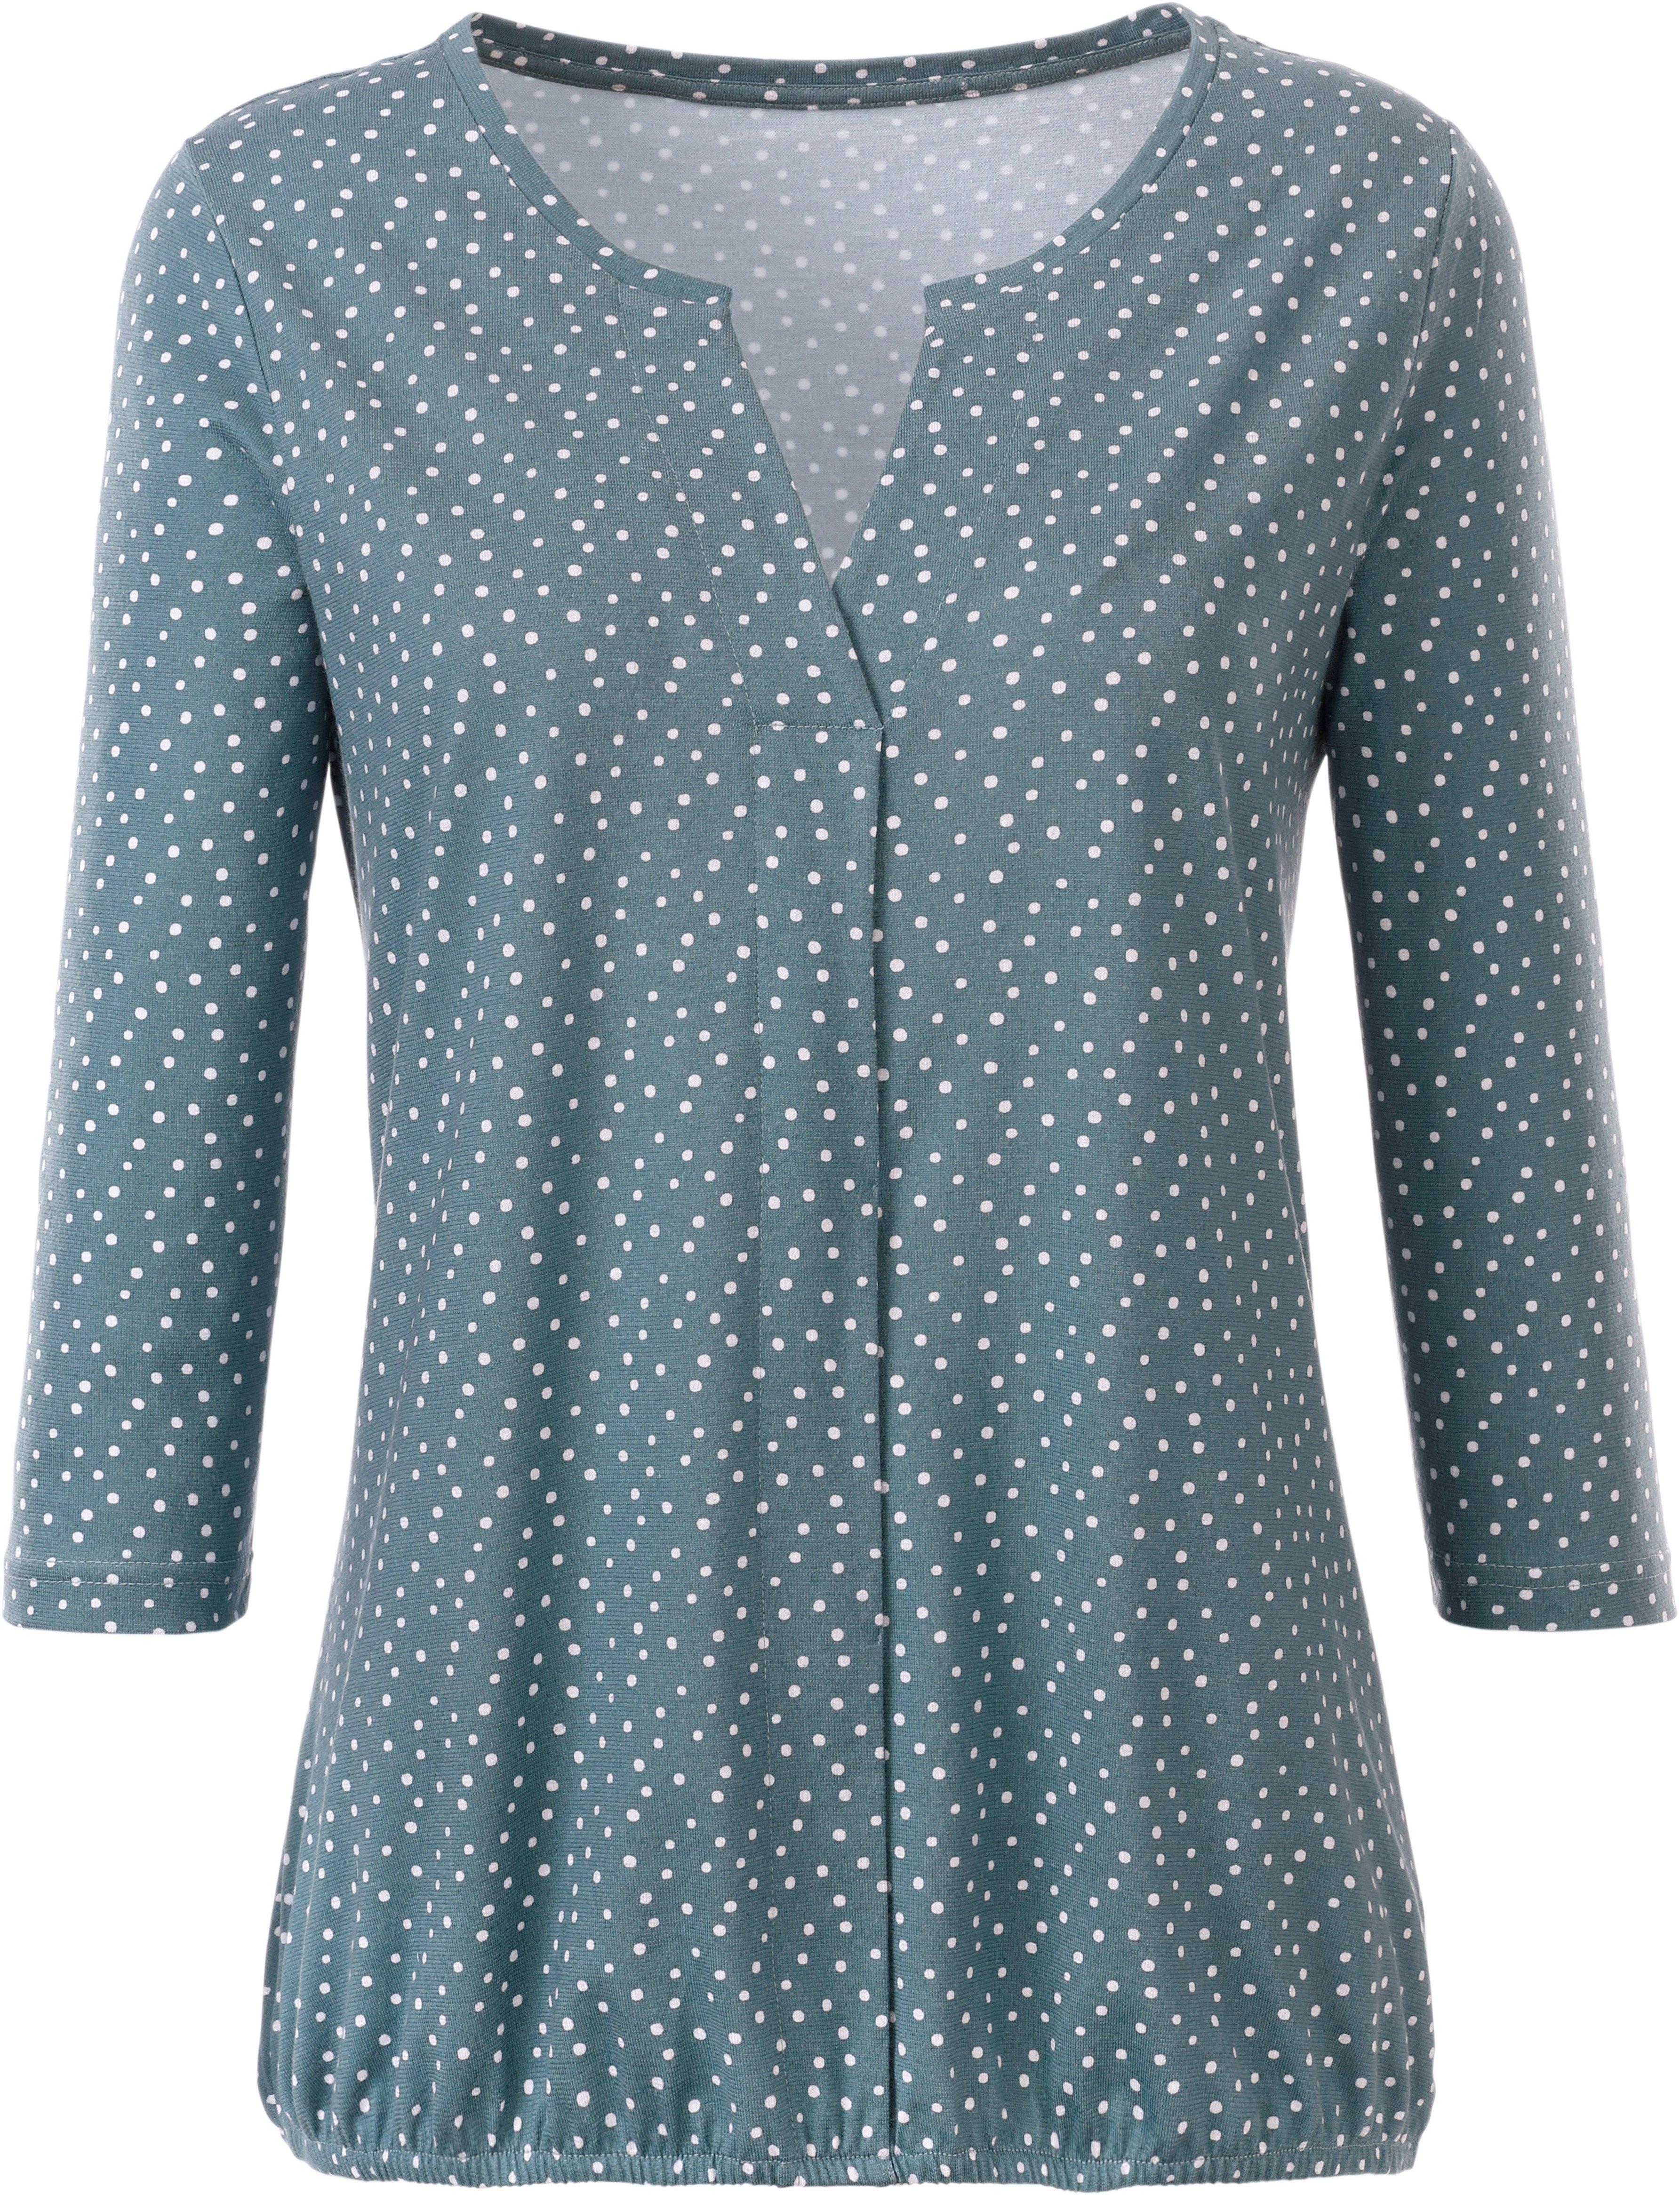 Classic Basics Classic Inspirationen shirt in casual blousonmodel online kopen op otto.nl